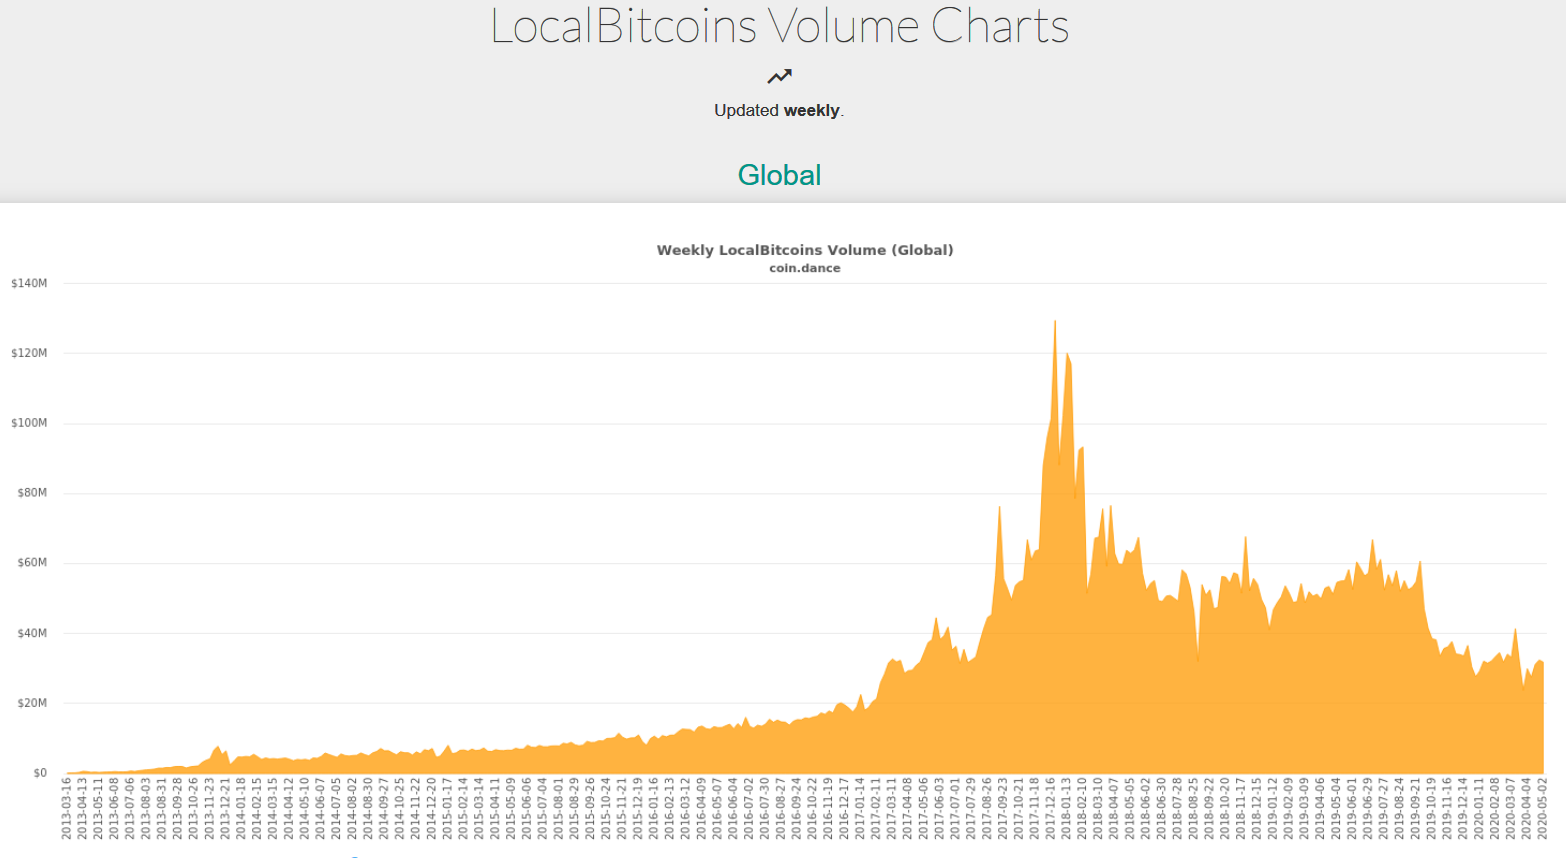 Россия оказалась лидером по объемам биткоин-транзакций на платформе LocalBitcoins